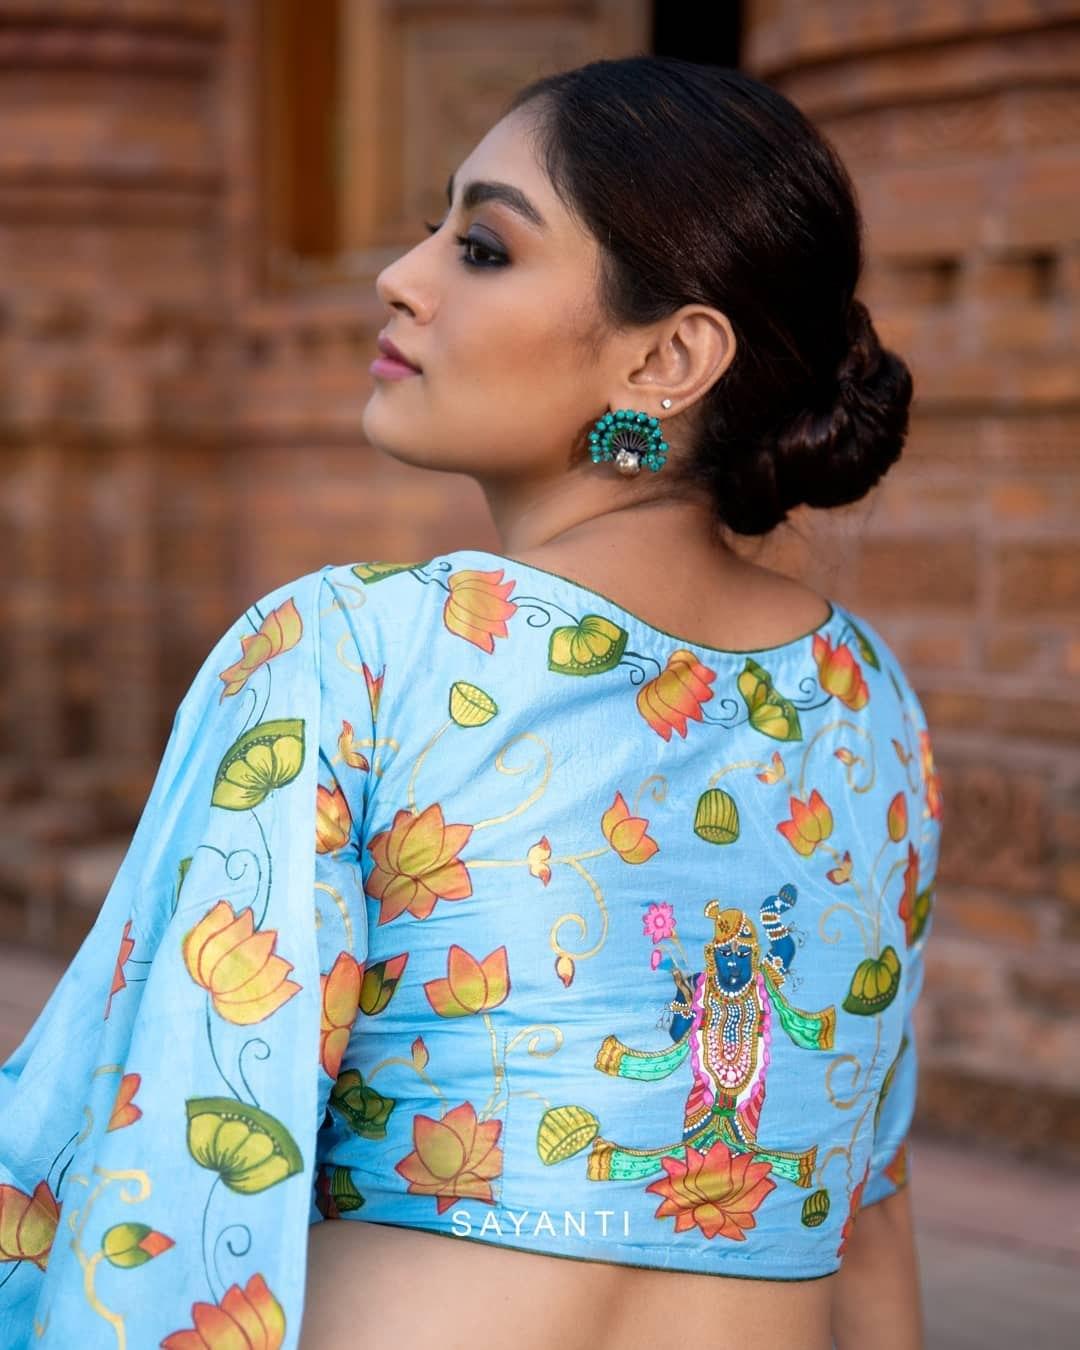 Aqua blue madhubani hand painted blouse-Sayanti ghosh